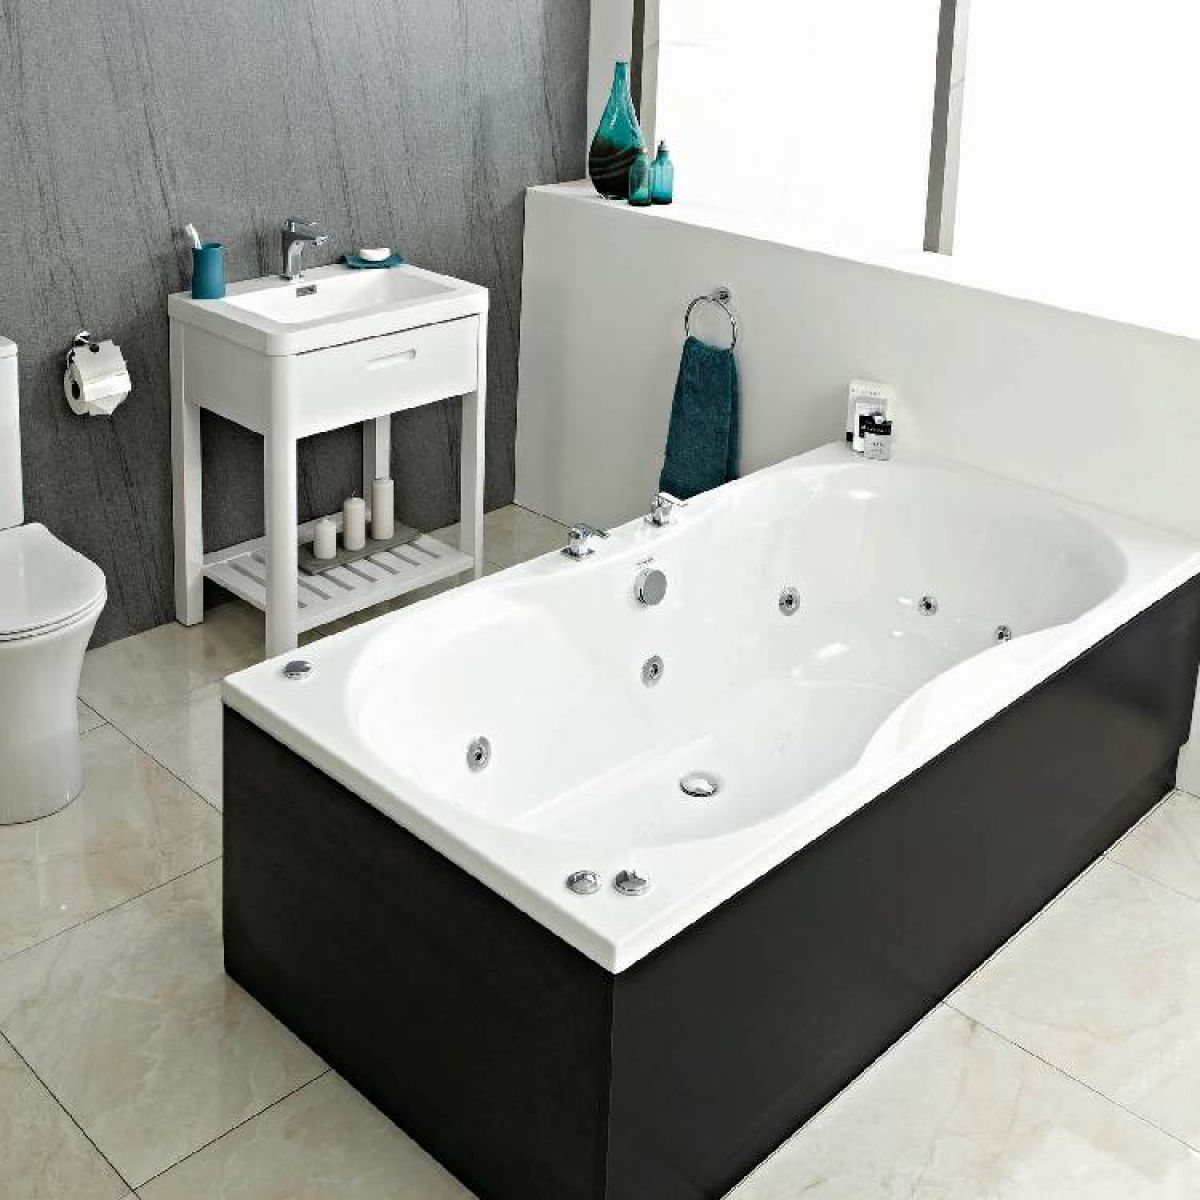 Whirlpool Baths Standard Widths  Extra Wide  UK Bathrooms